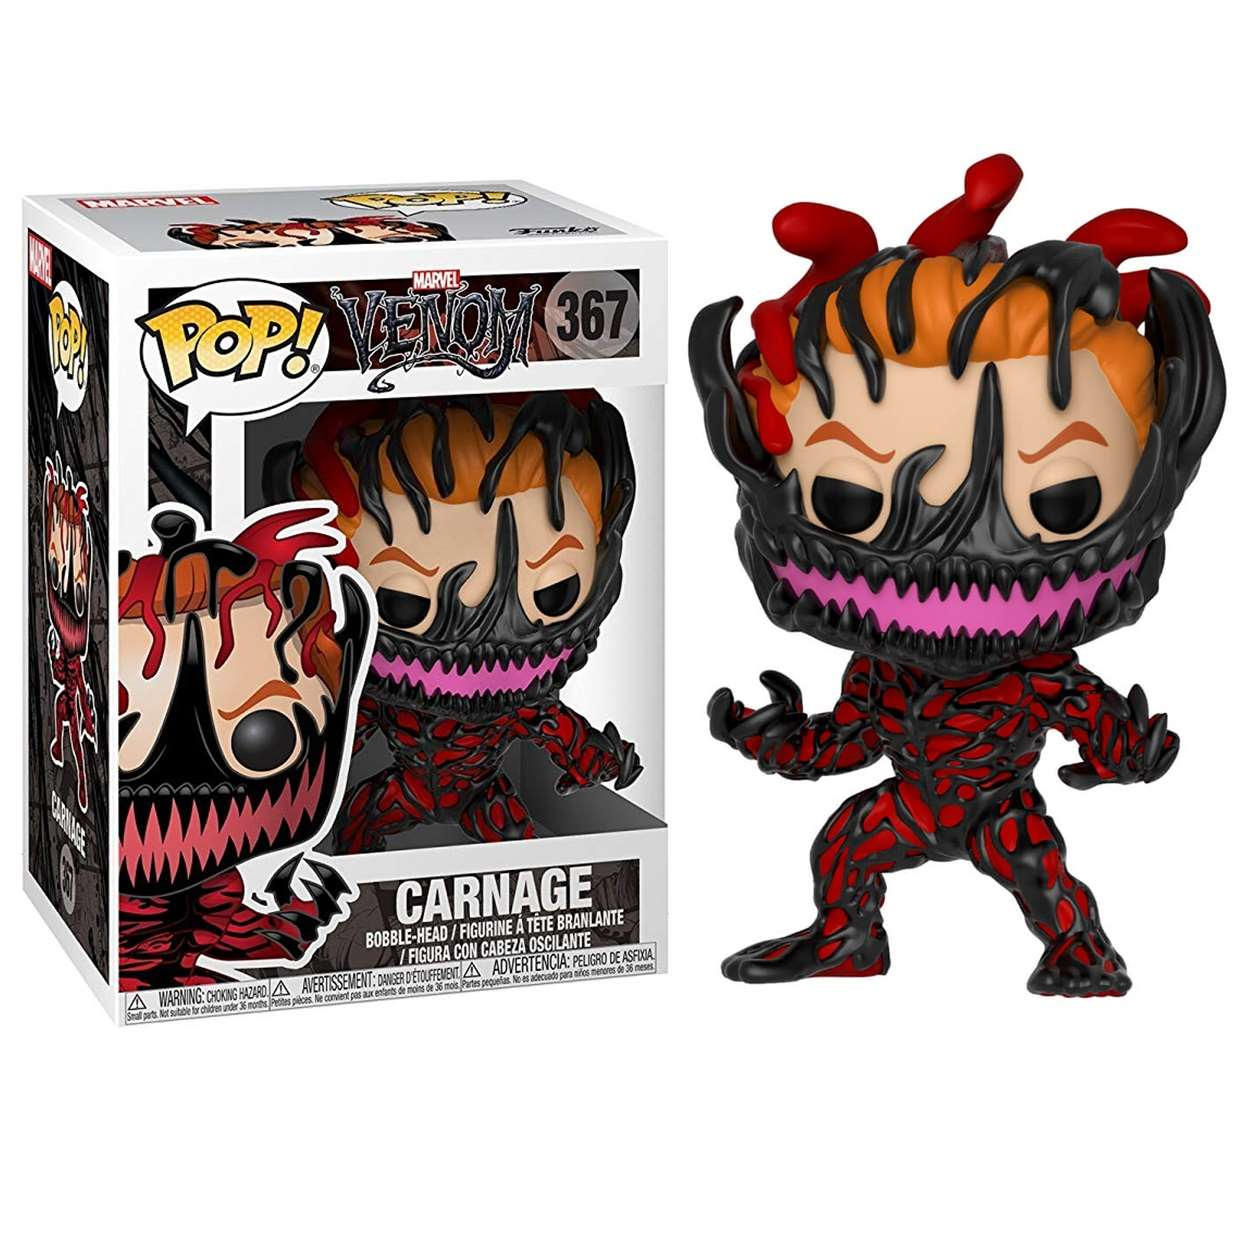 Carnage #367 Figura Venomized Marvel Venom Funko Pop!